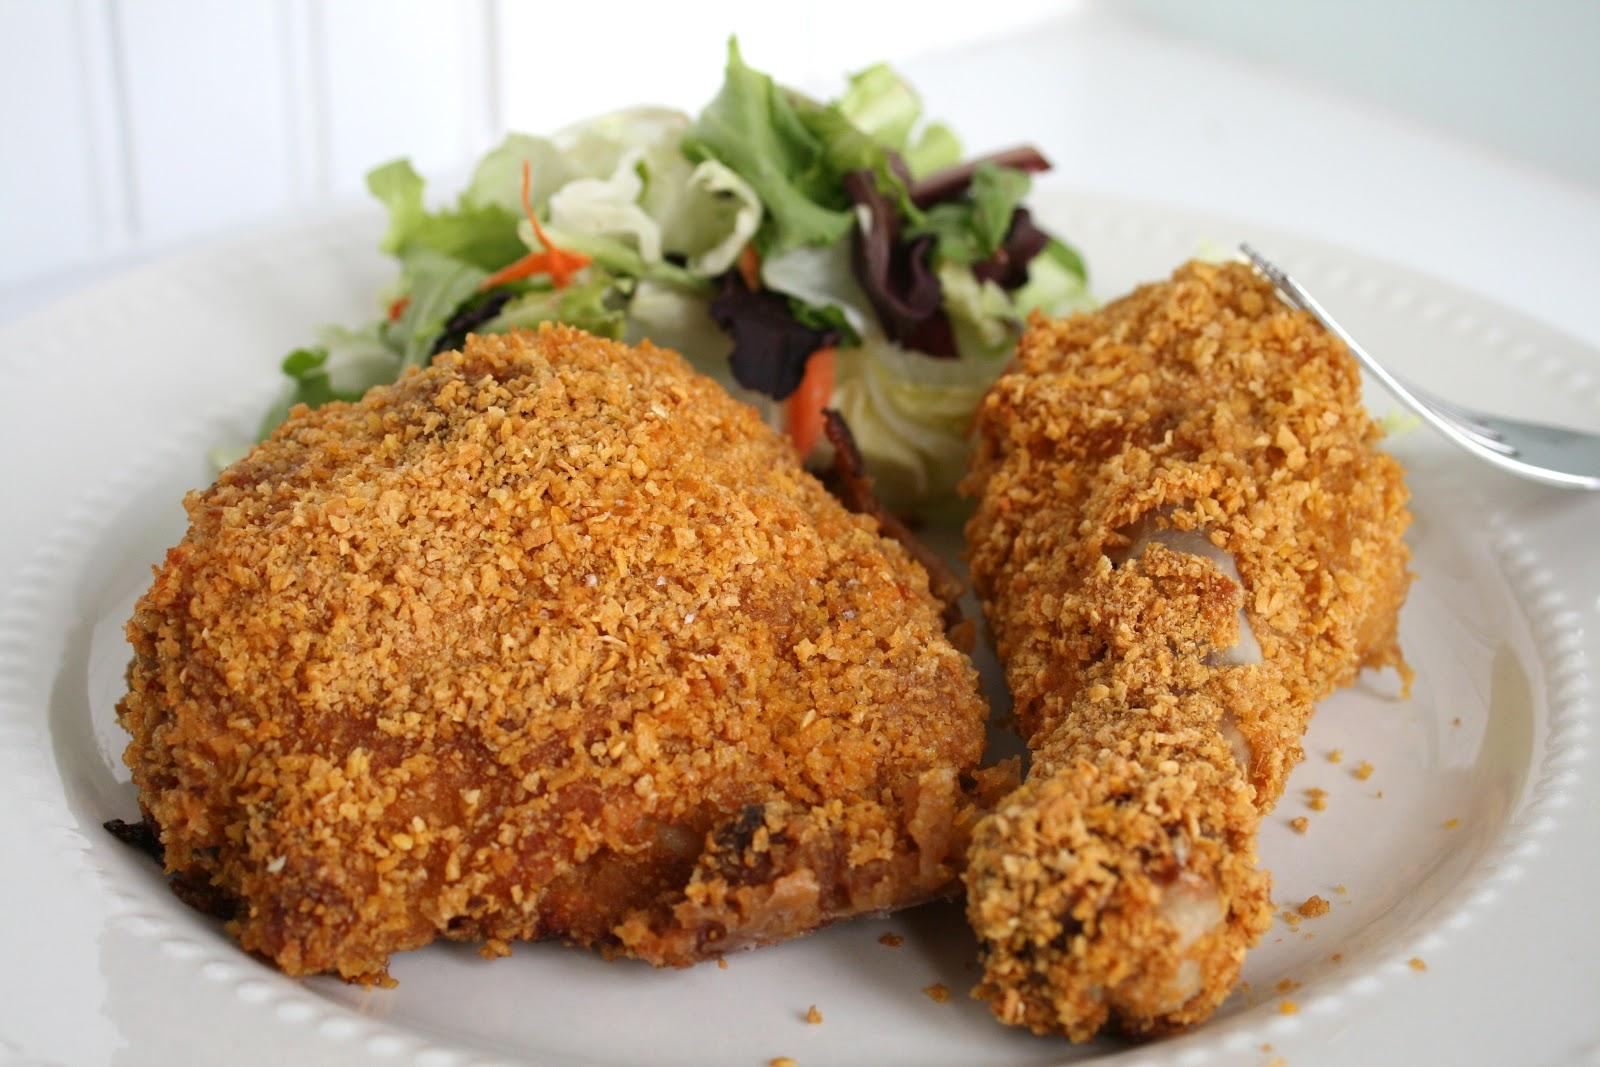 ... chicken crunchy oven fried corn flake crispy fried chickenâ corn